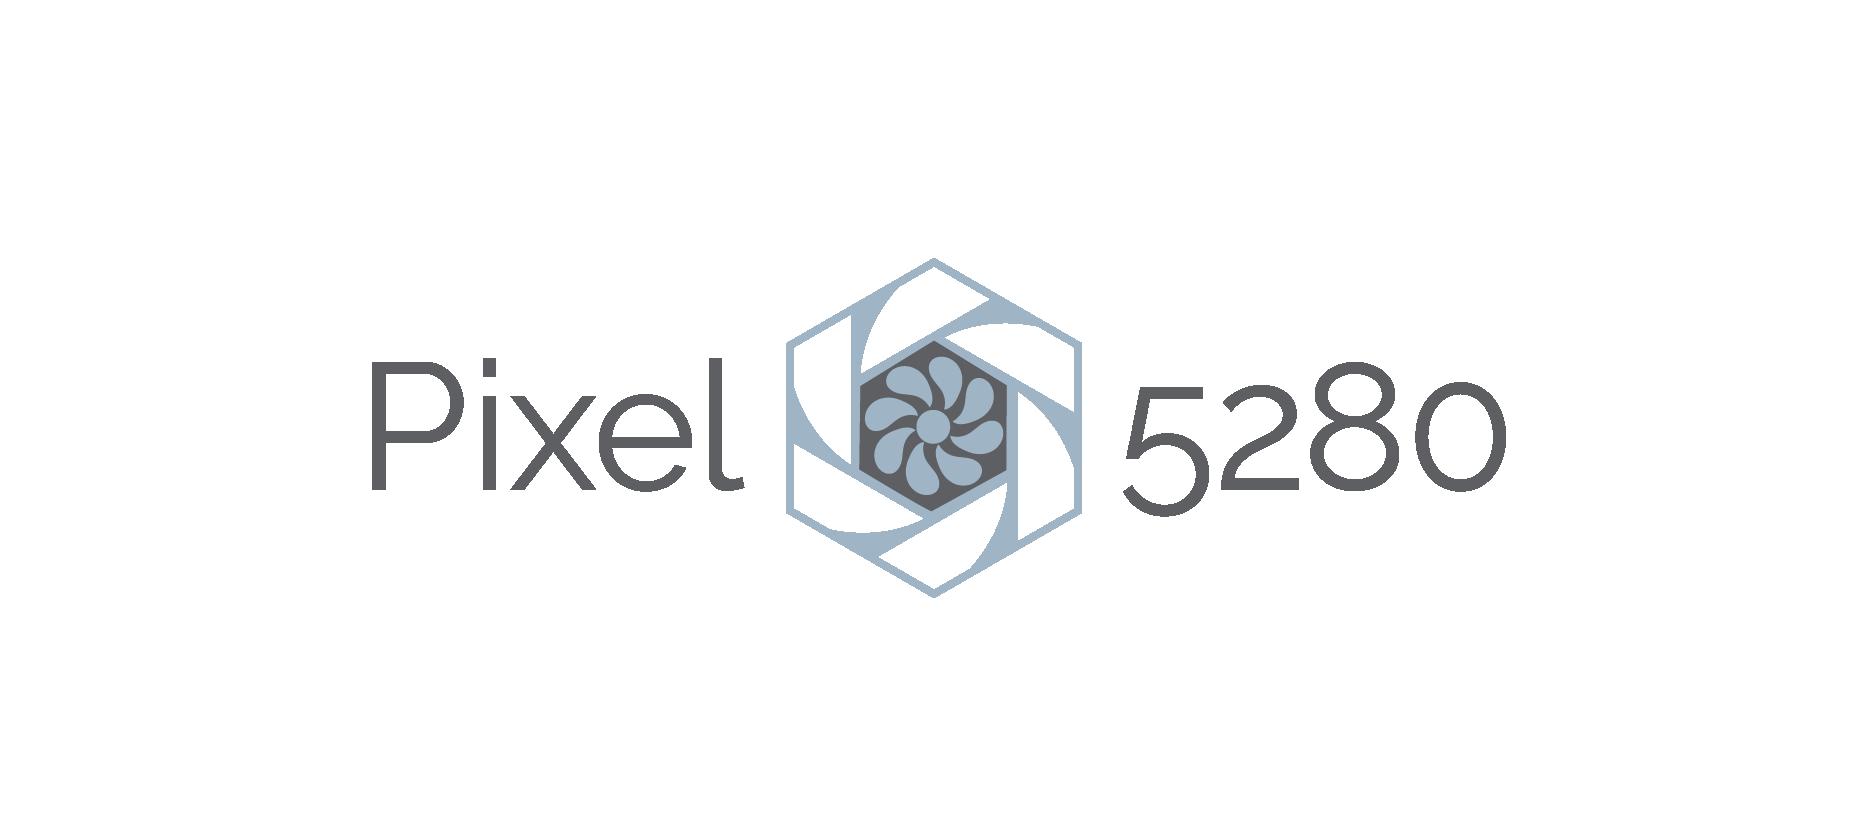 Pixel5280